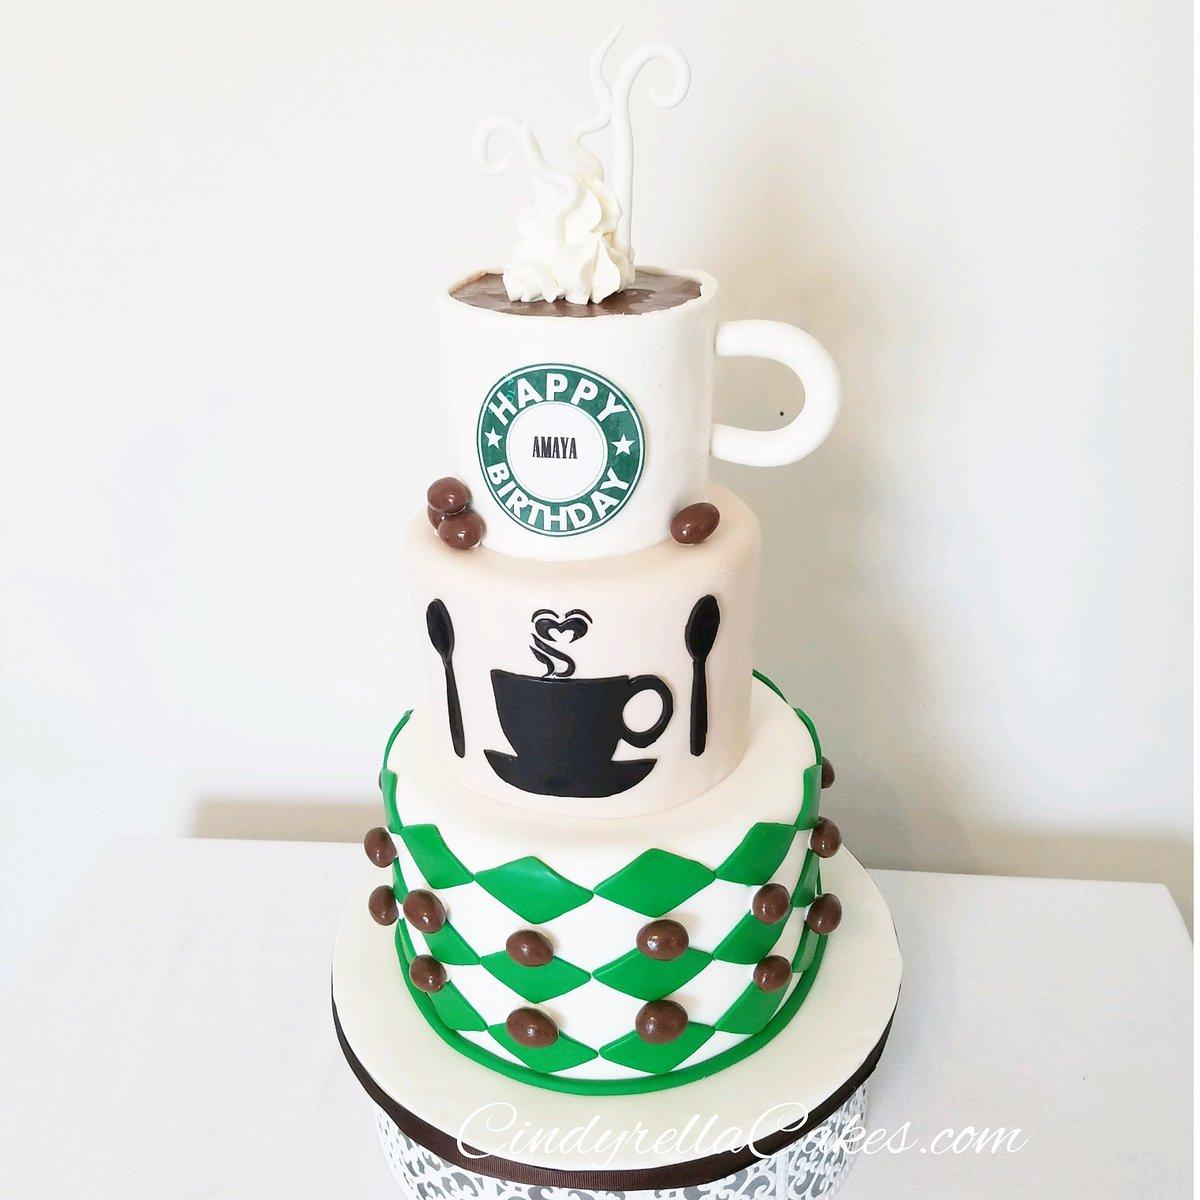 Brilliant Cindyrella Cakes Pa Twitter Fbf Starbucks Theme Birthday Cake Funny Birthday Cards Online Fluifree Goldxyz